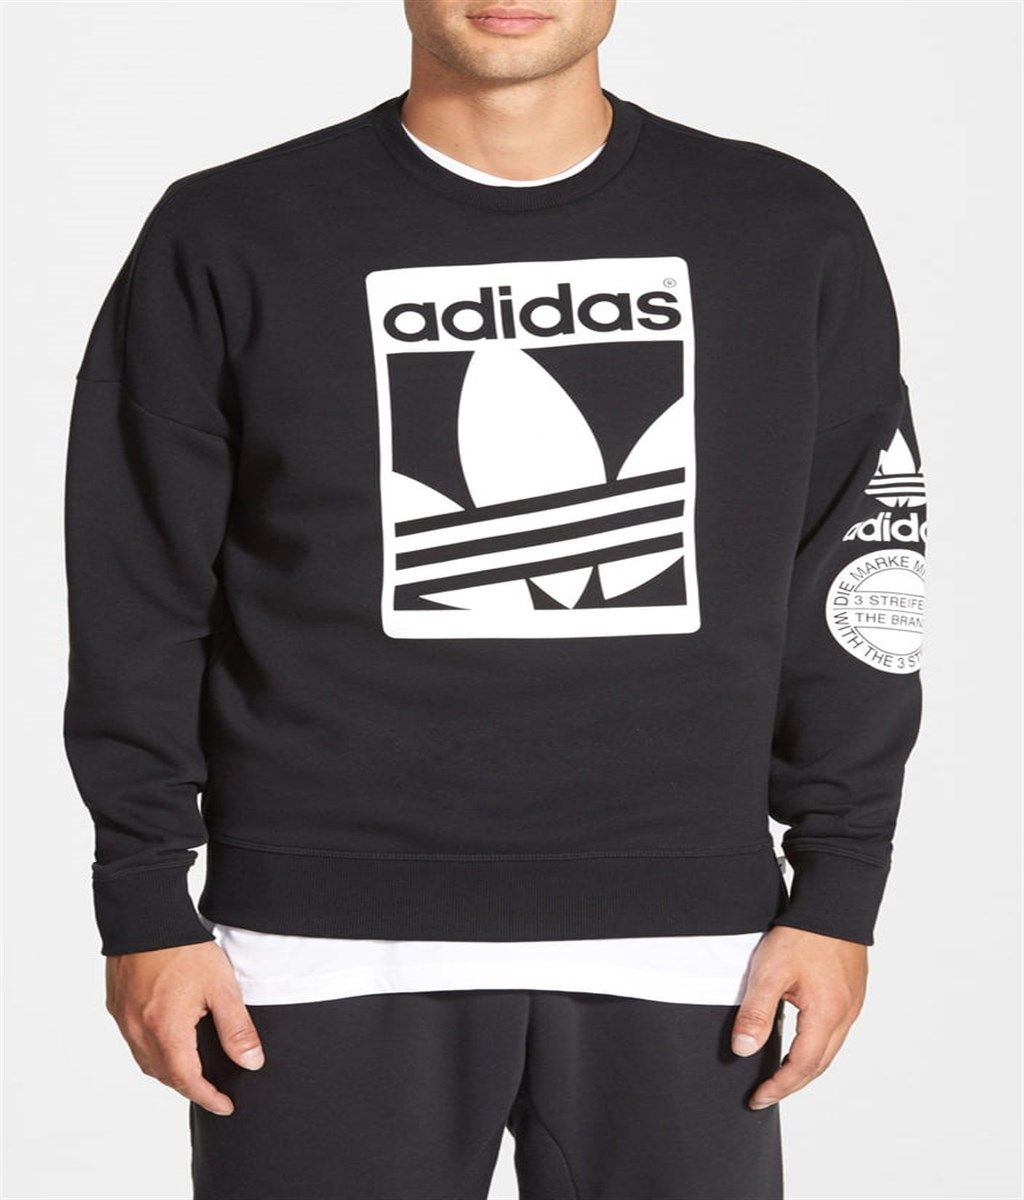 Adidas Essentials Men S 3 Stripes Tricot Track Jacket In 2021 Adidas Sweater Sweatshirts Graphic Crewneck Sweatshirt [ 1200 x 1024 Pixel ]